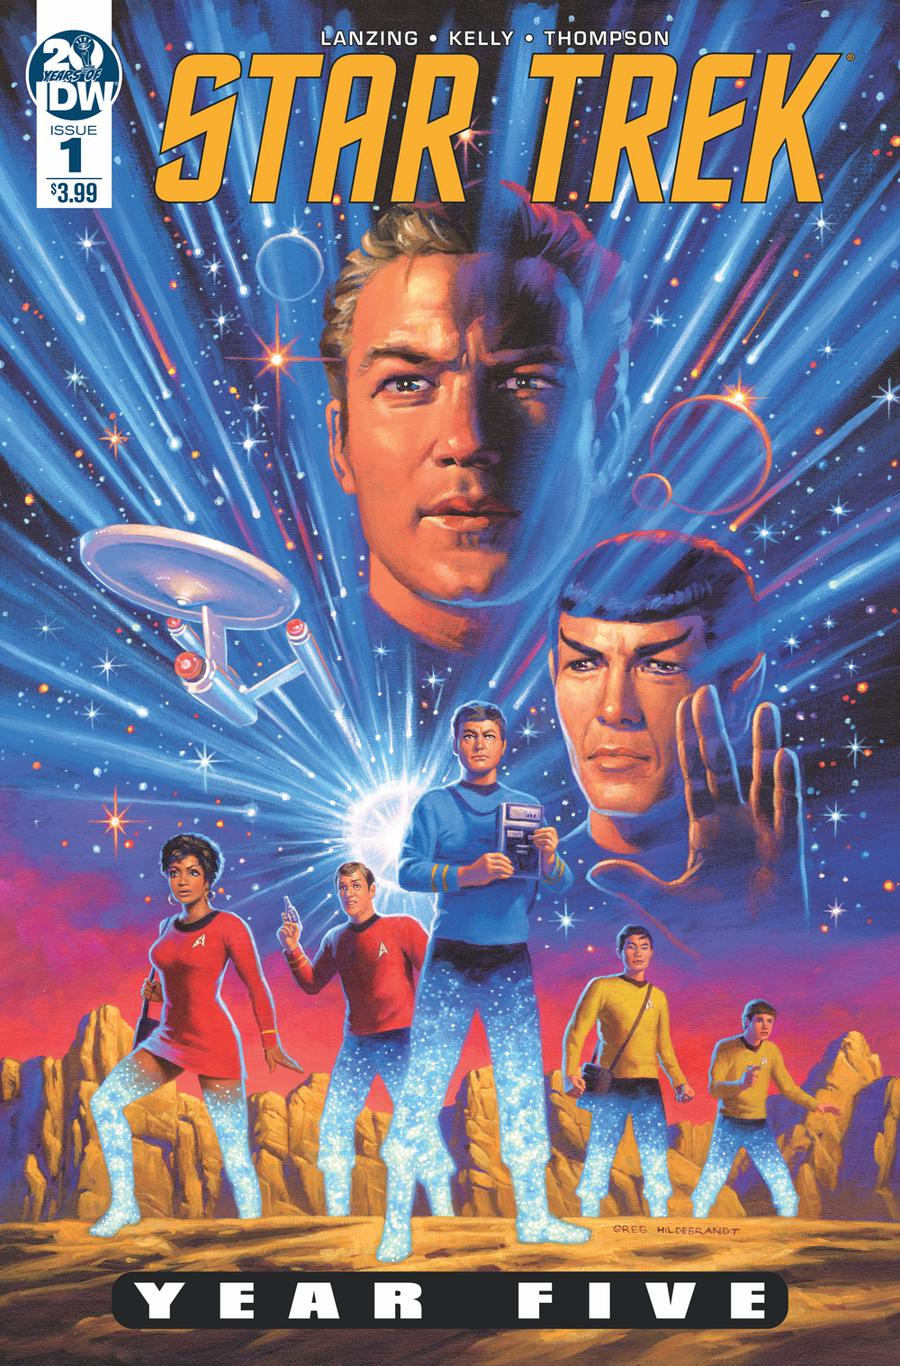 Star Trek Year Five #1 Cover A Regular Greg Hildebrandt Cover